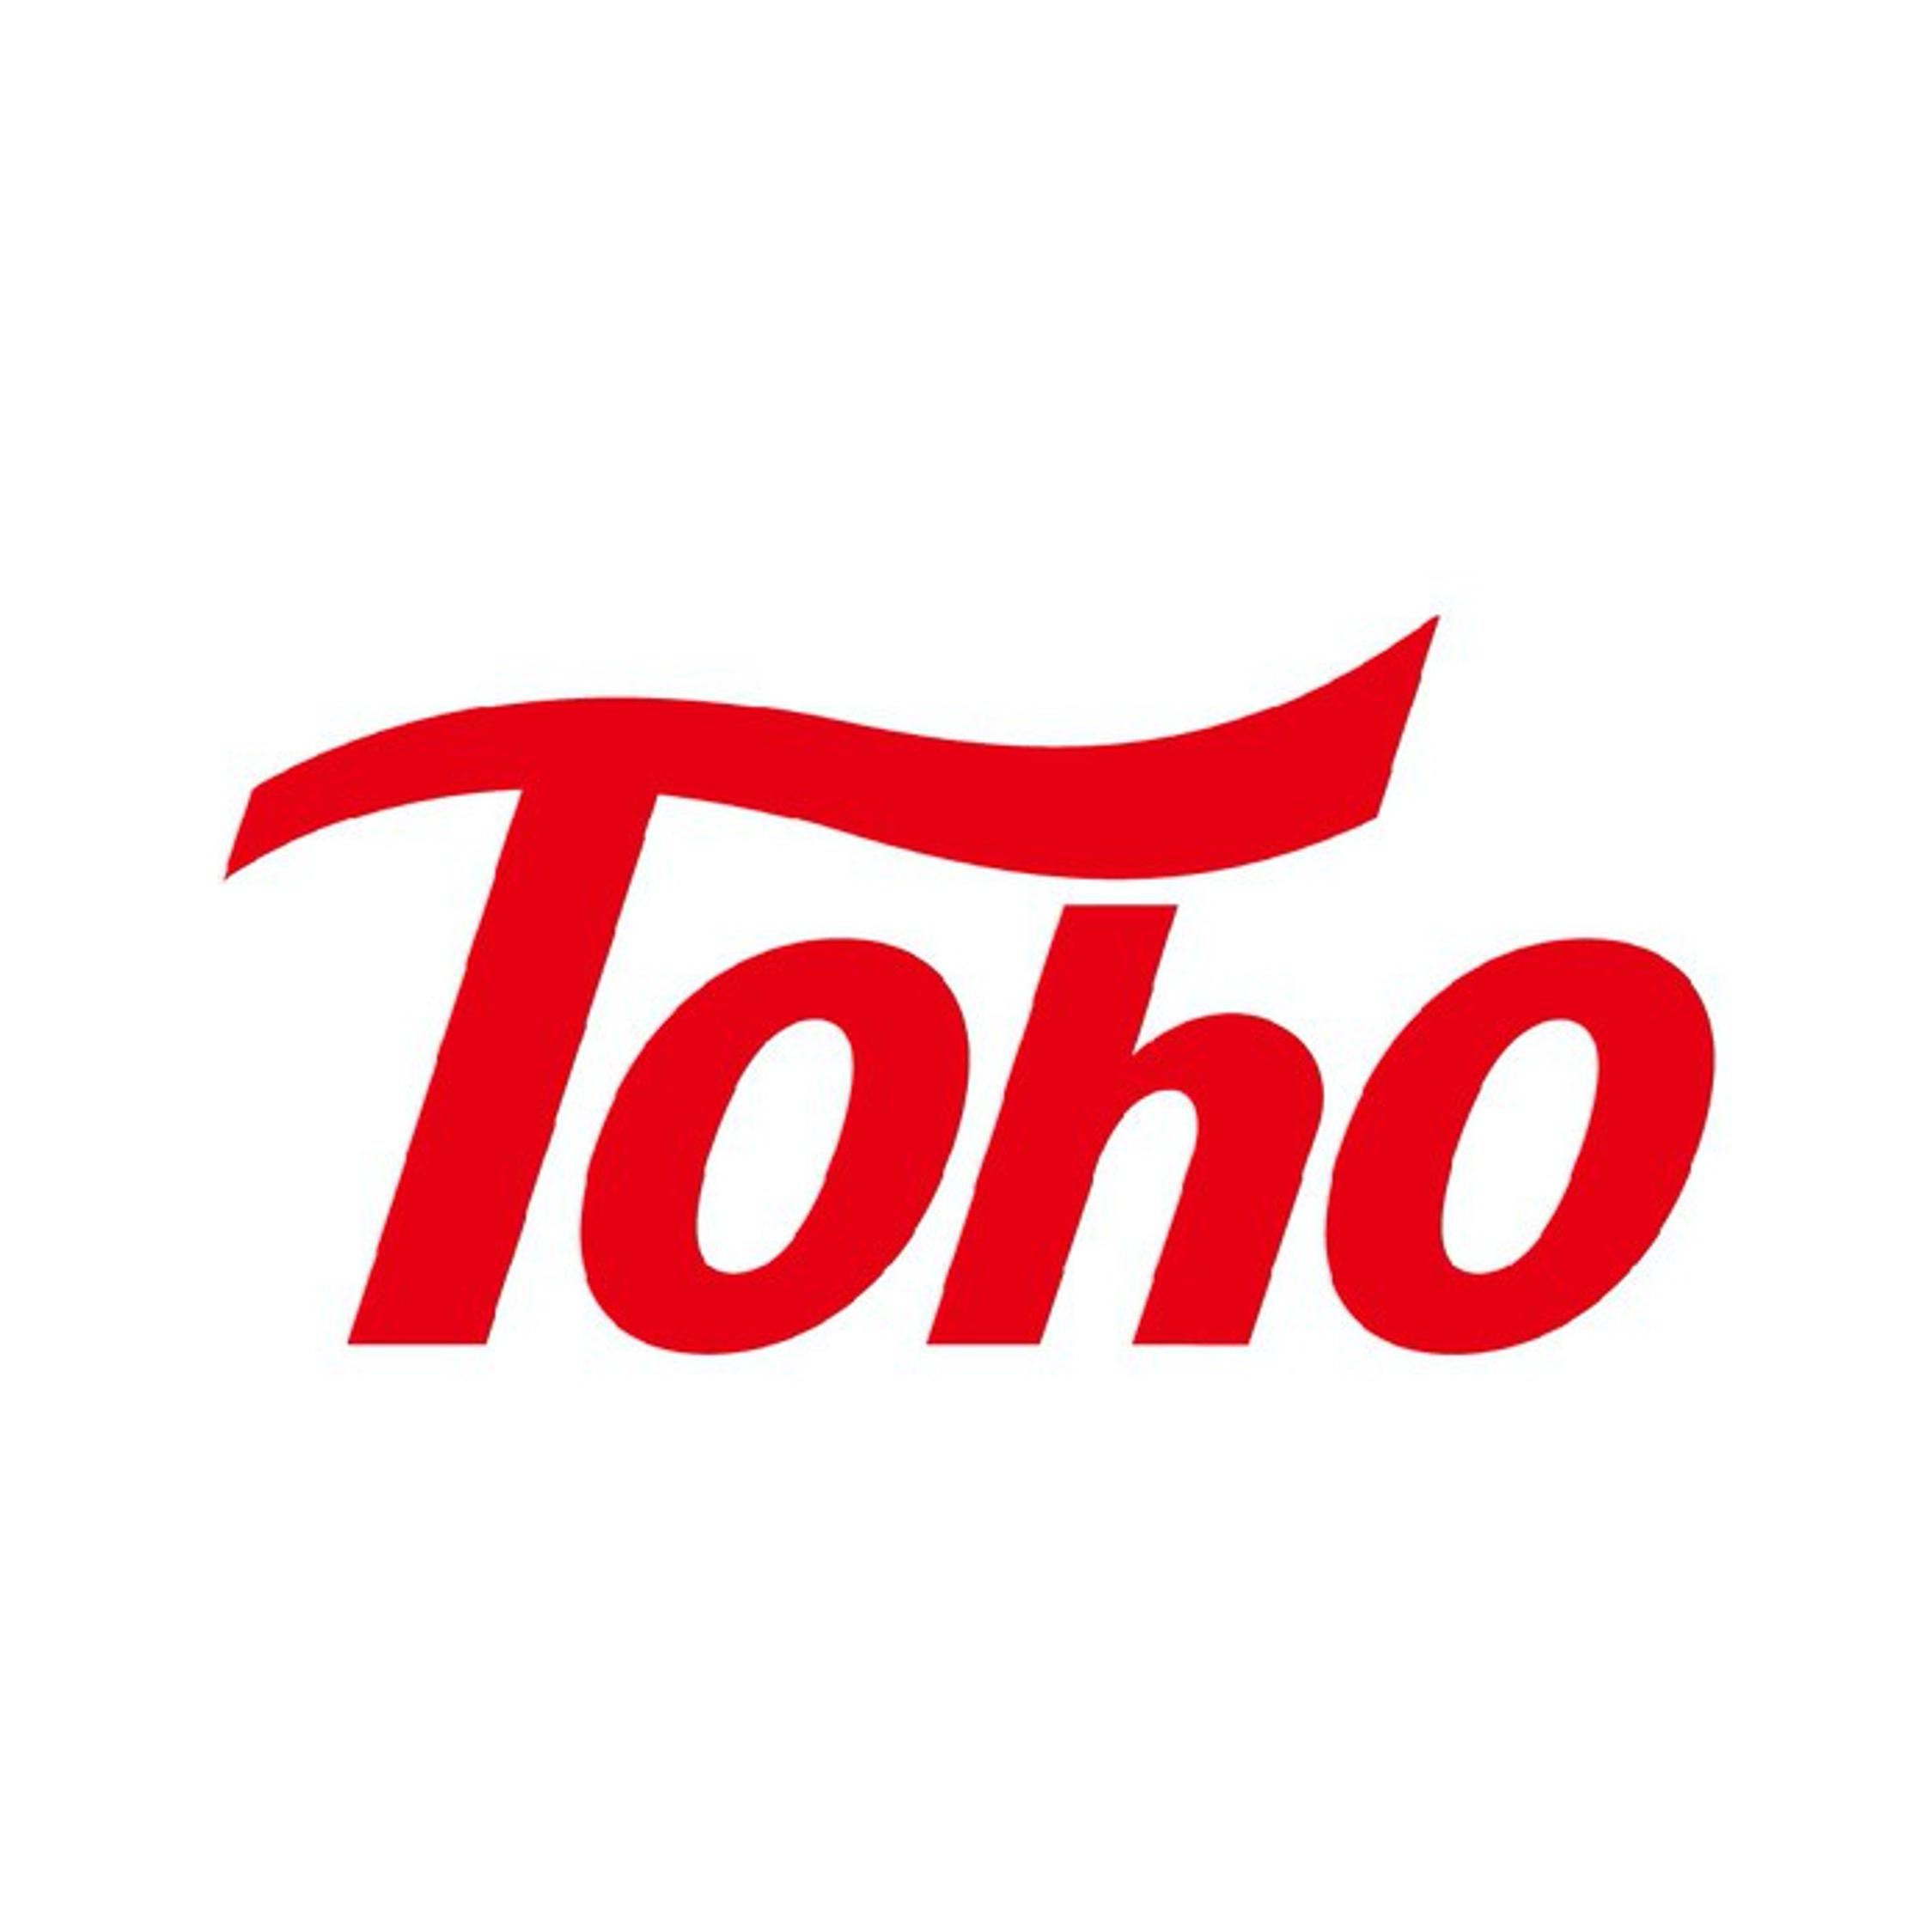 Logo tohostore